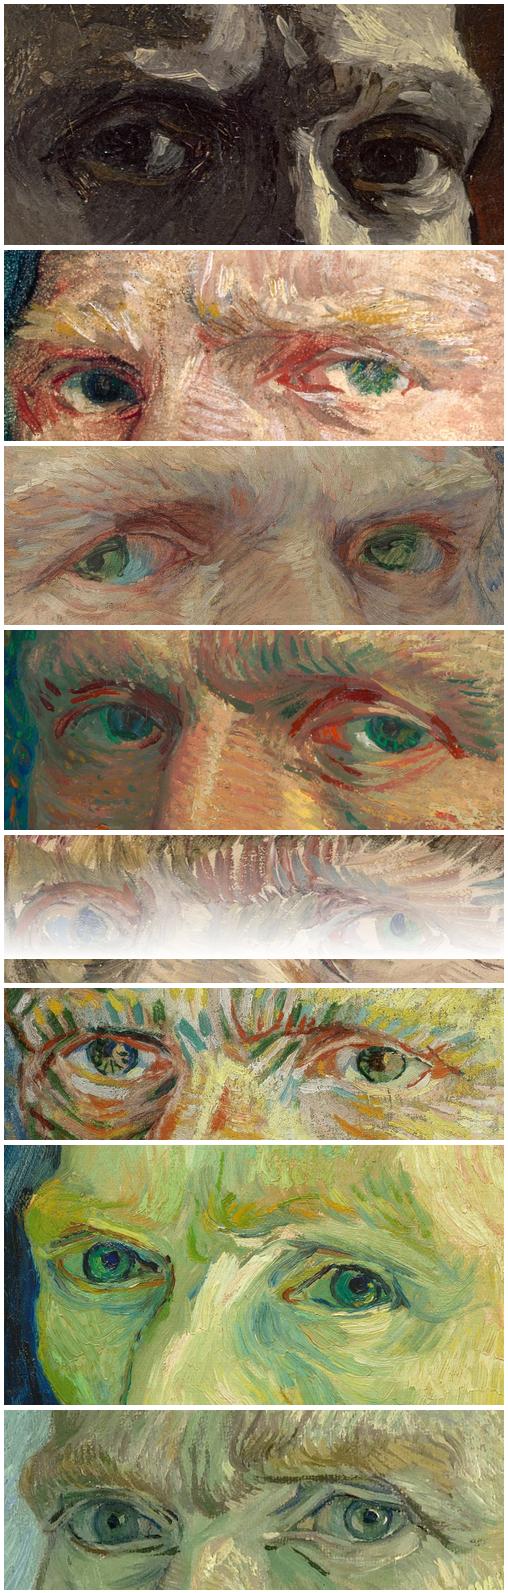 Les yeux de Vincent van Gogh: Self Portraits,  1886-1889                                                                                                                                                     More